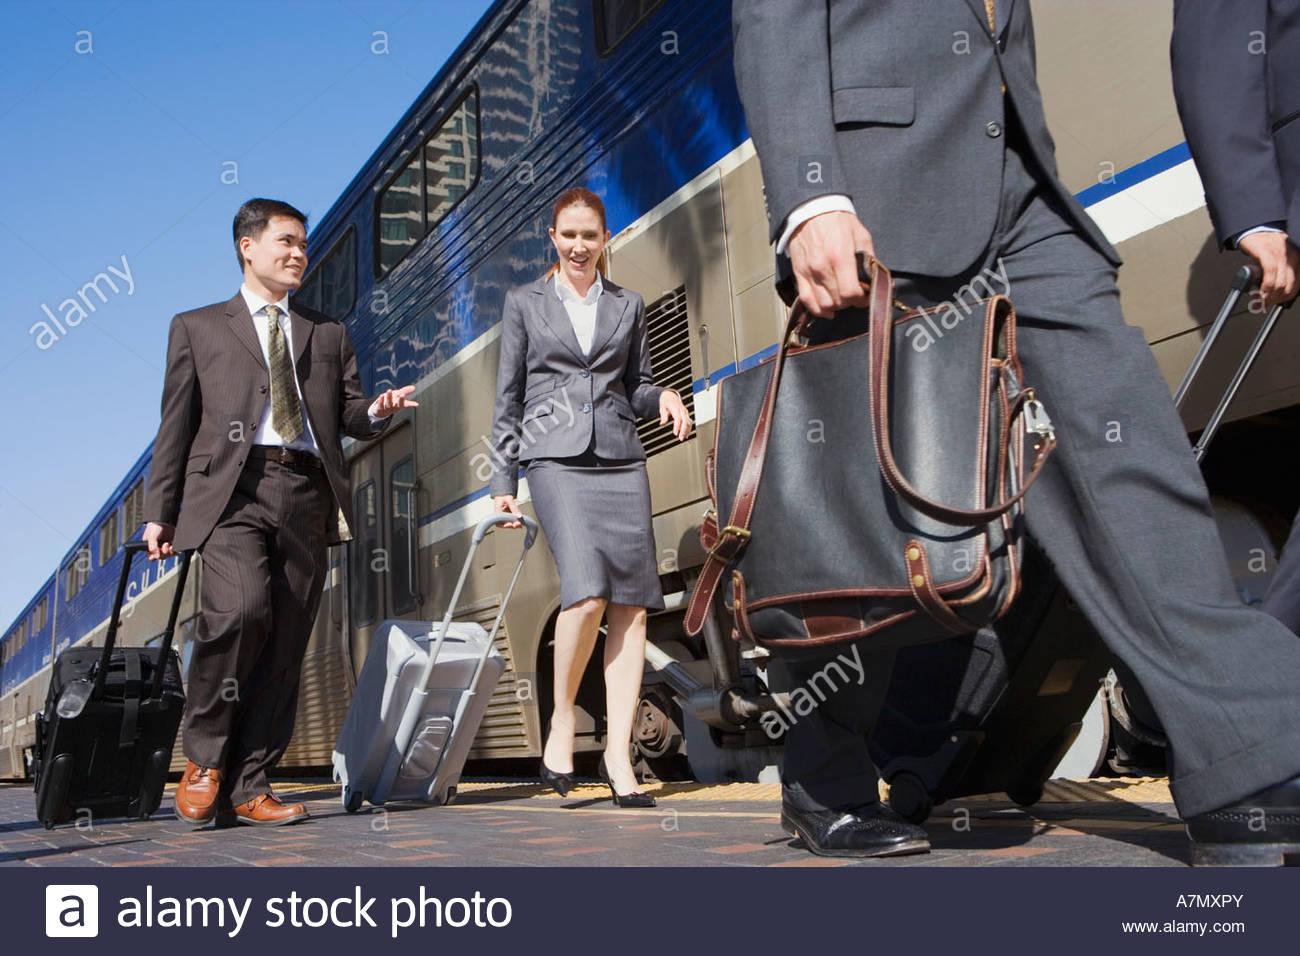 Four business people walking along railway platform beside stationary passenger train surface level - Stock Image